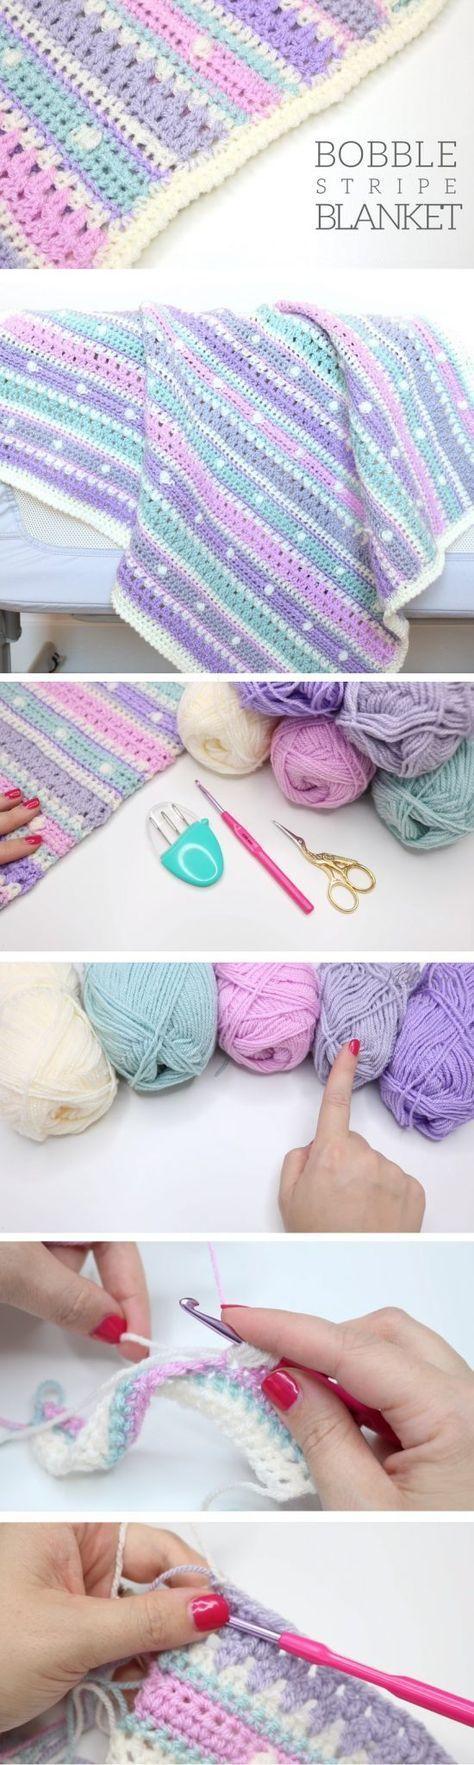 35 of The Best FREE Crochet Blanket Patterns